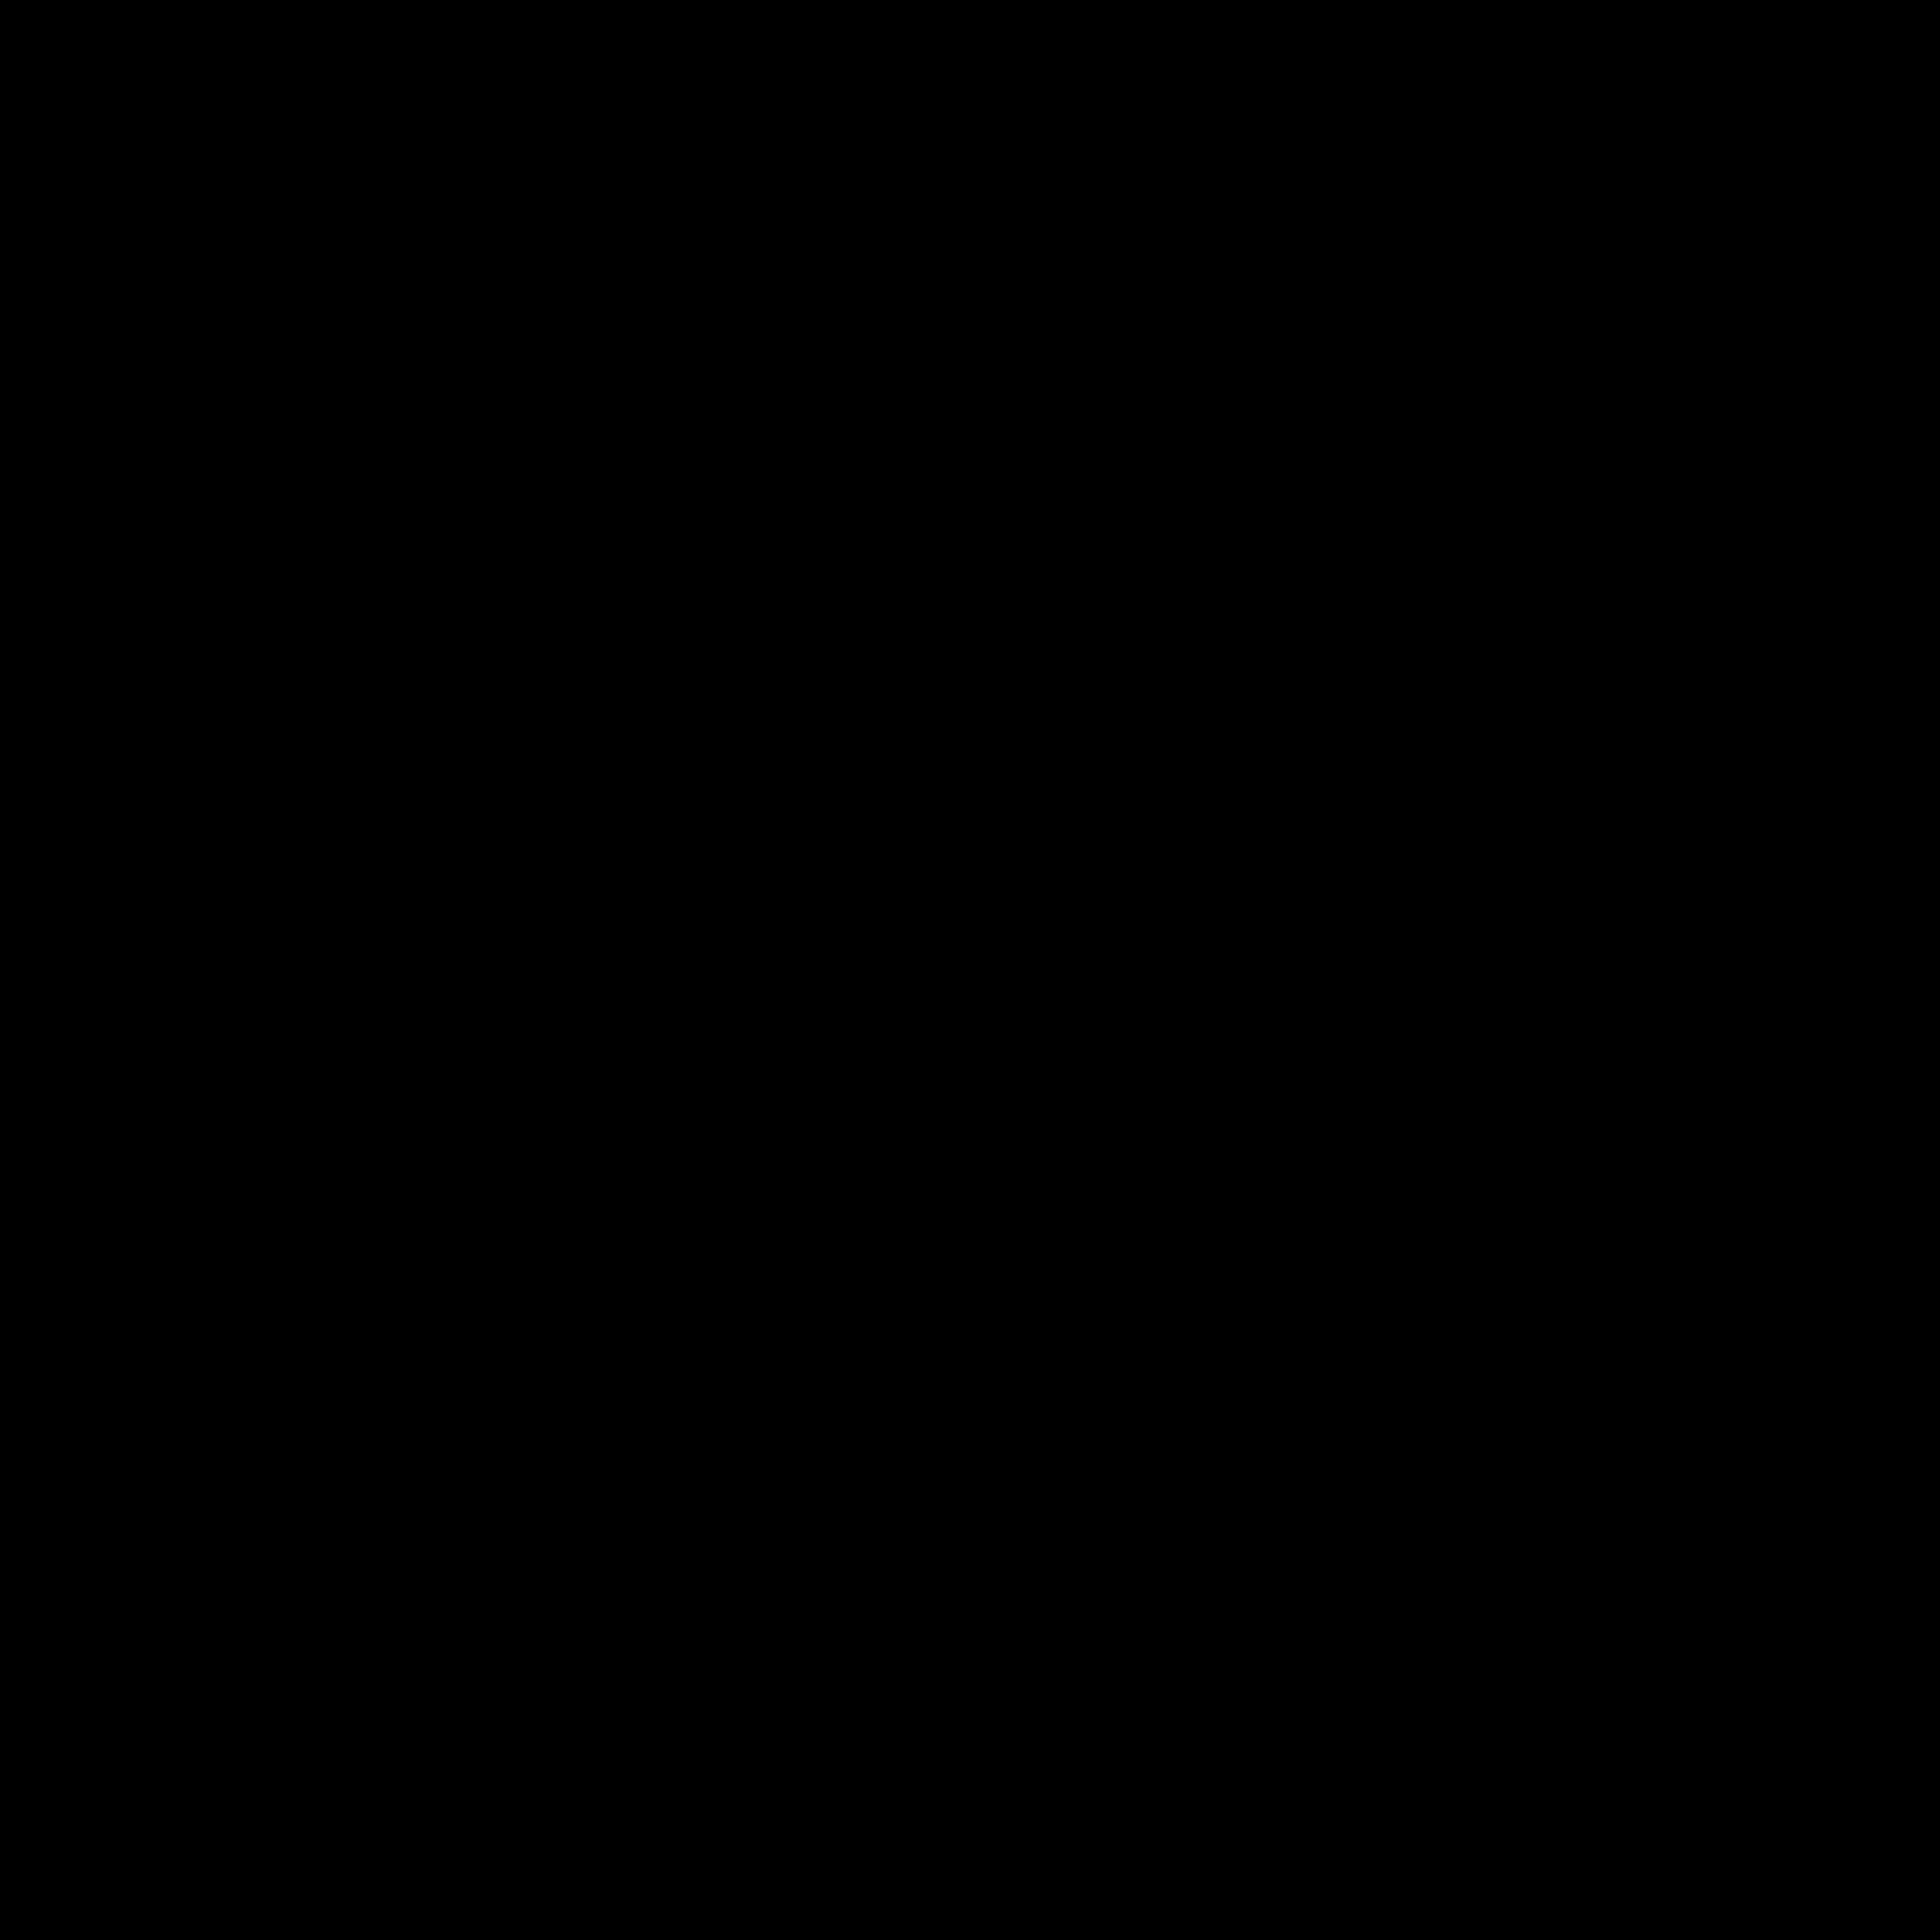 the beatles logo 0 - The Beatles Logo